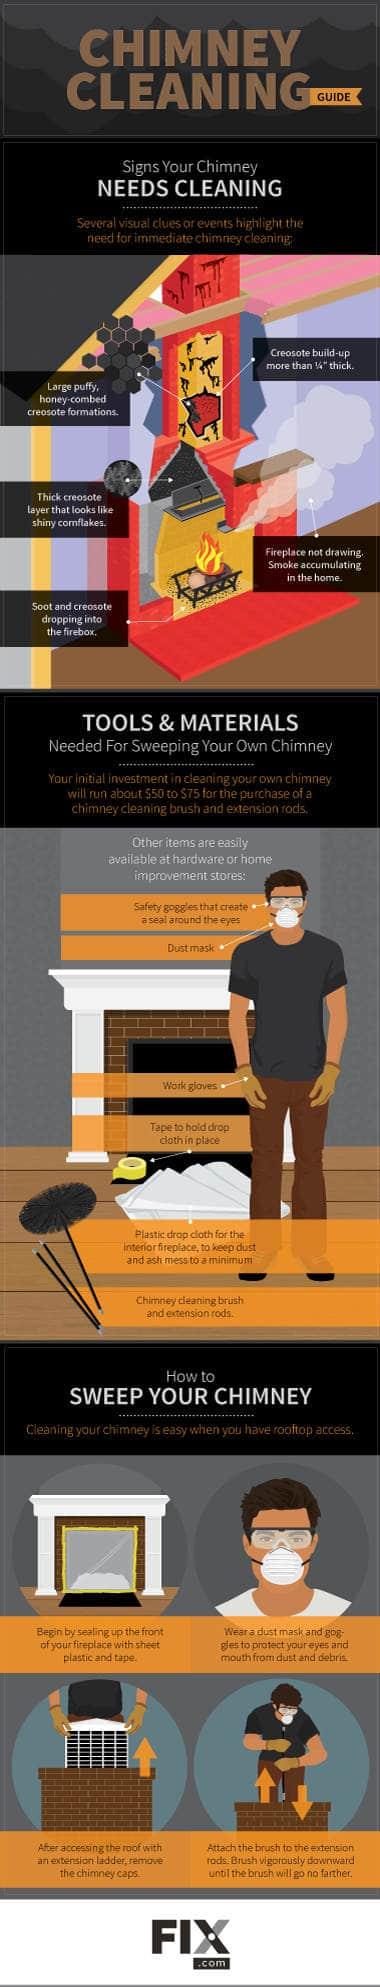 pasos para limpiar chimenea infografía